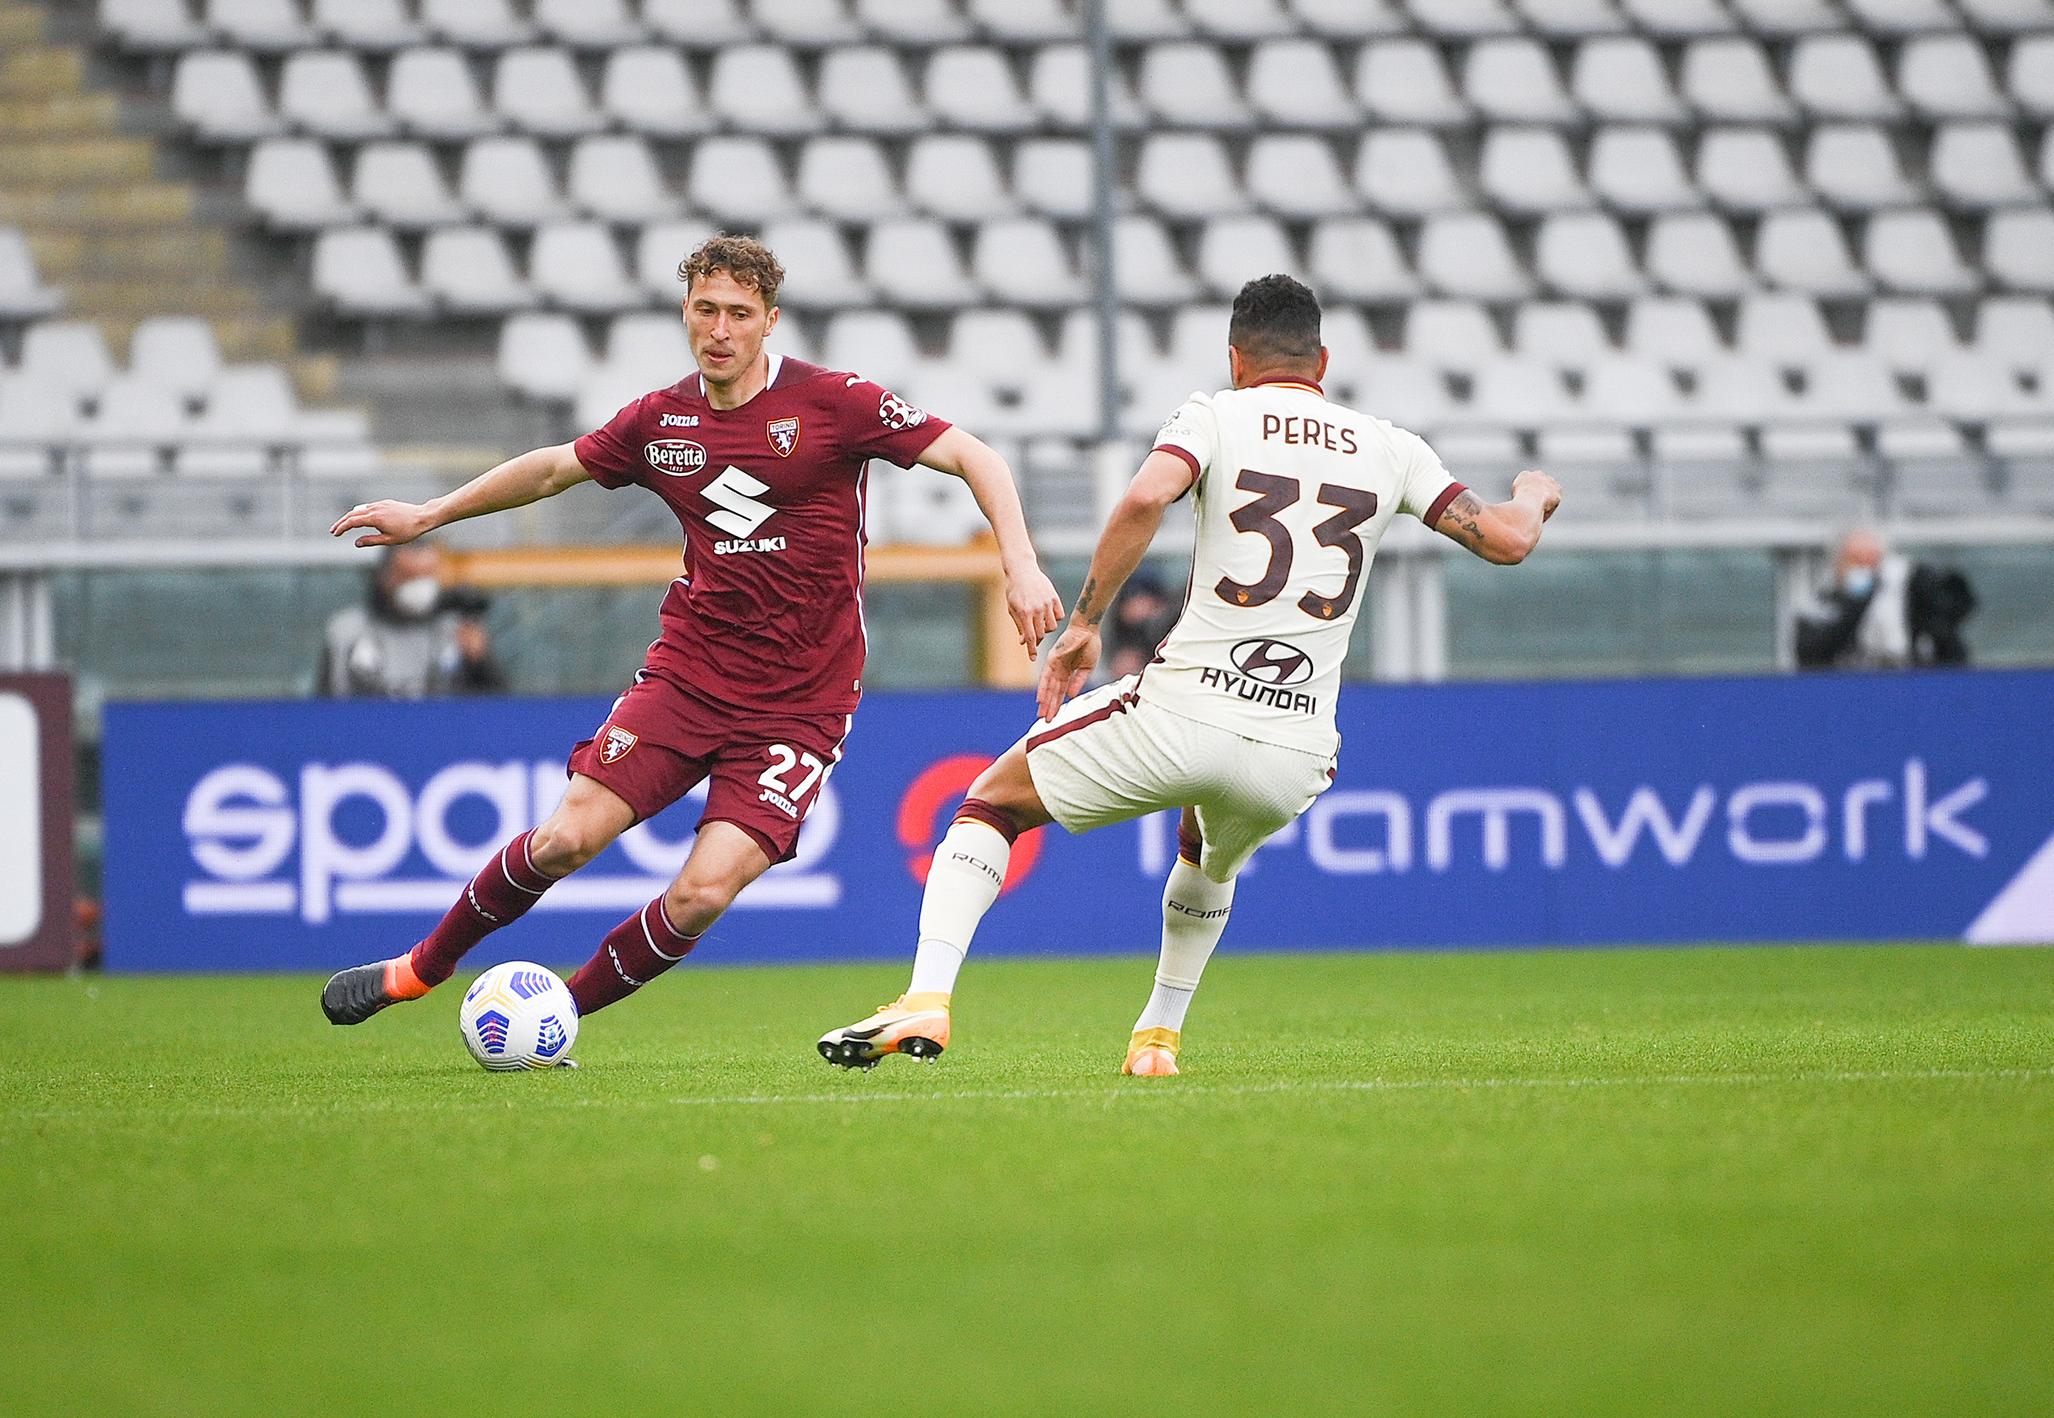 Torino bate Roma de virada e se afasta do rebaixamento no Italiano; assista!